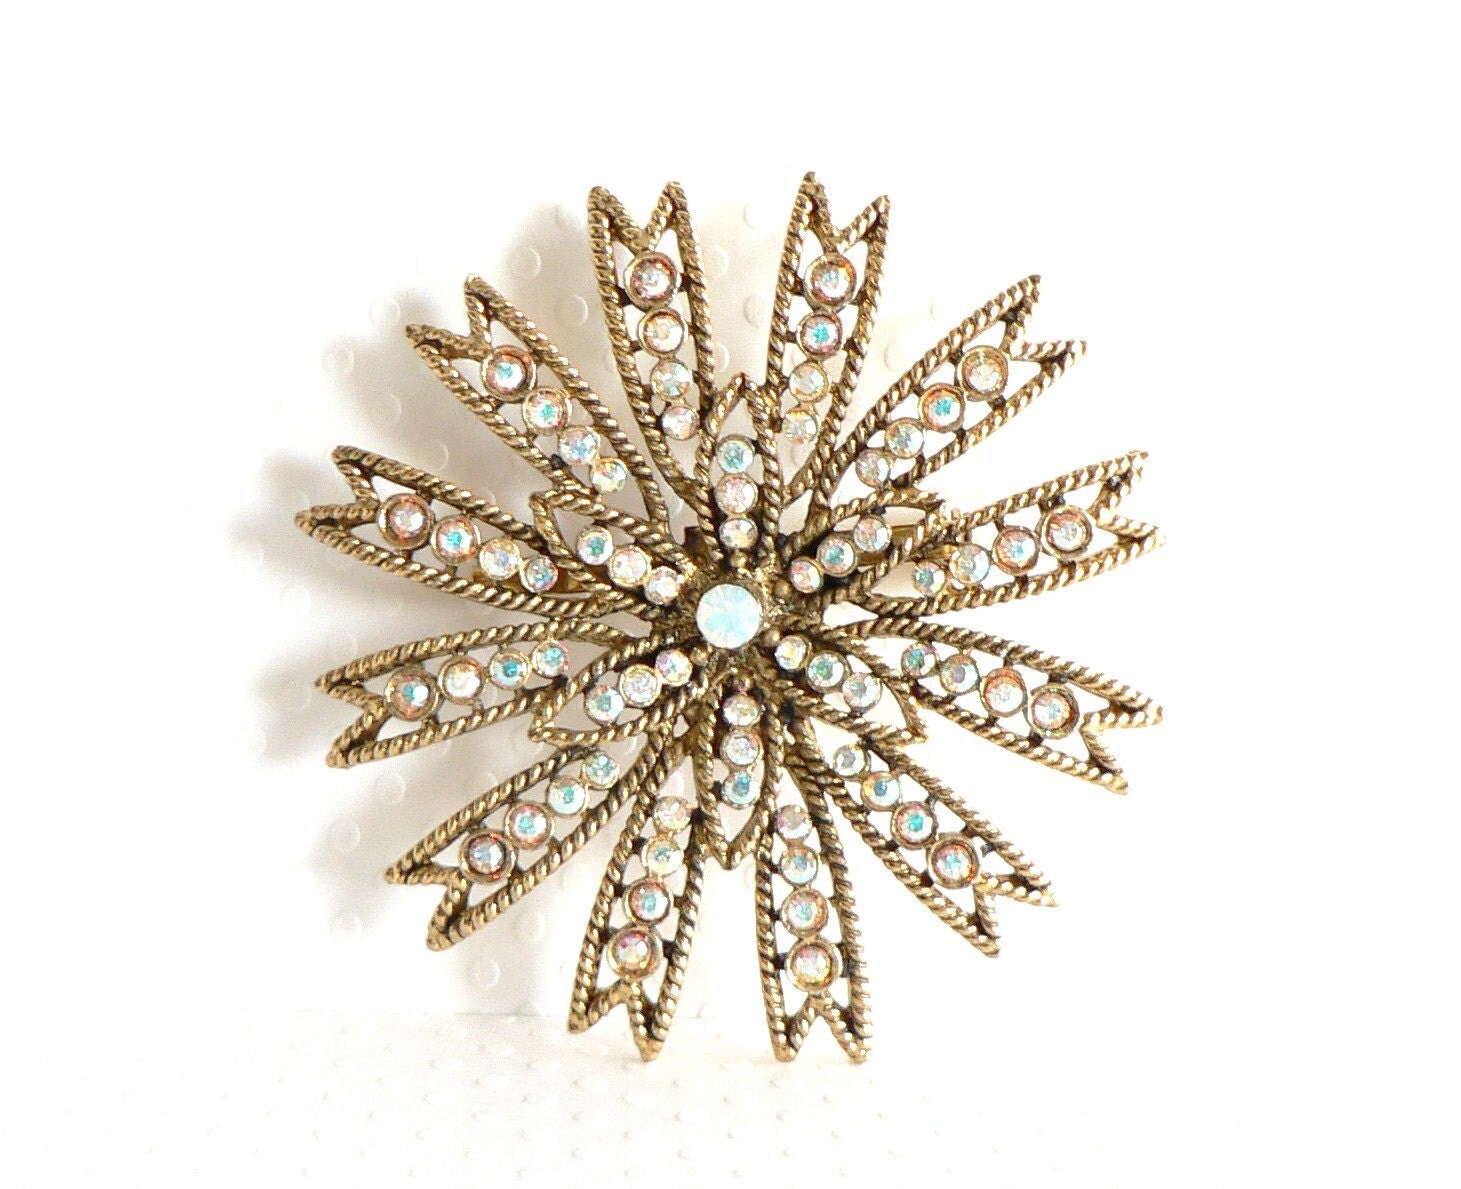 Vintage Weiss Brooch Aurora Borealis Snowflake AB Brooch - auntemilie